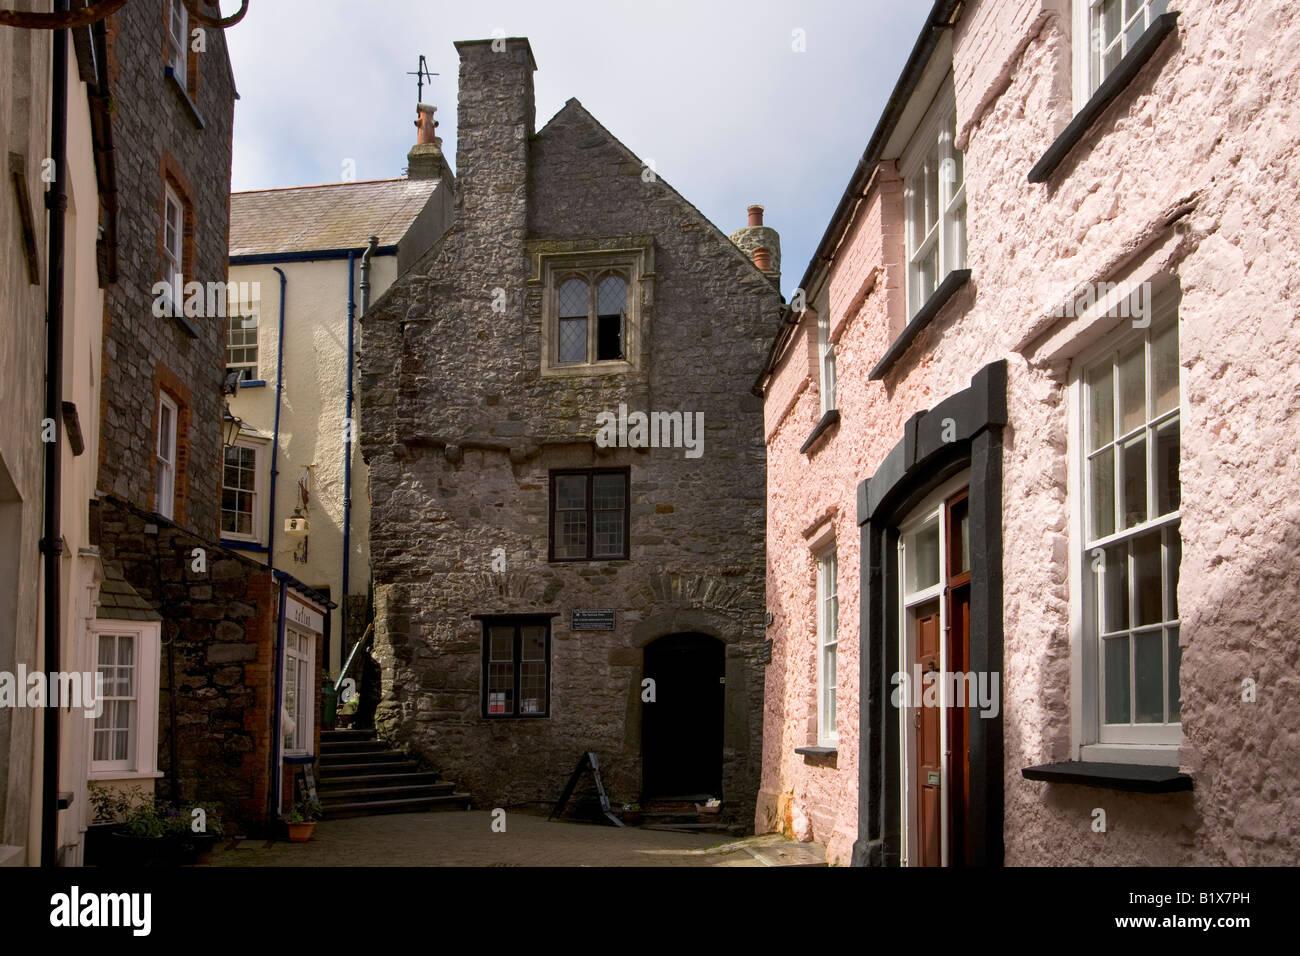 Tudor Merchants House, Tenby, Pembrokeshire, Wales, UK - Stock Image